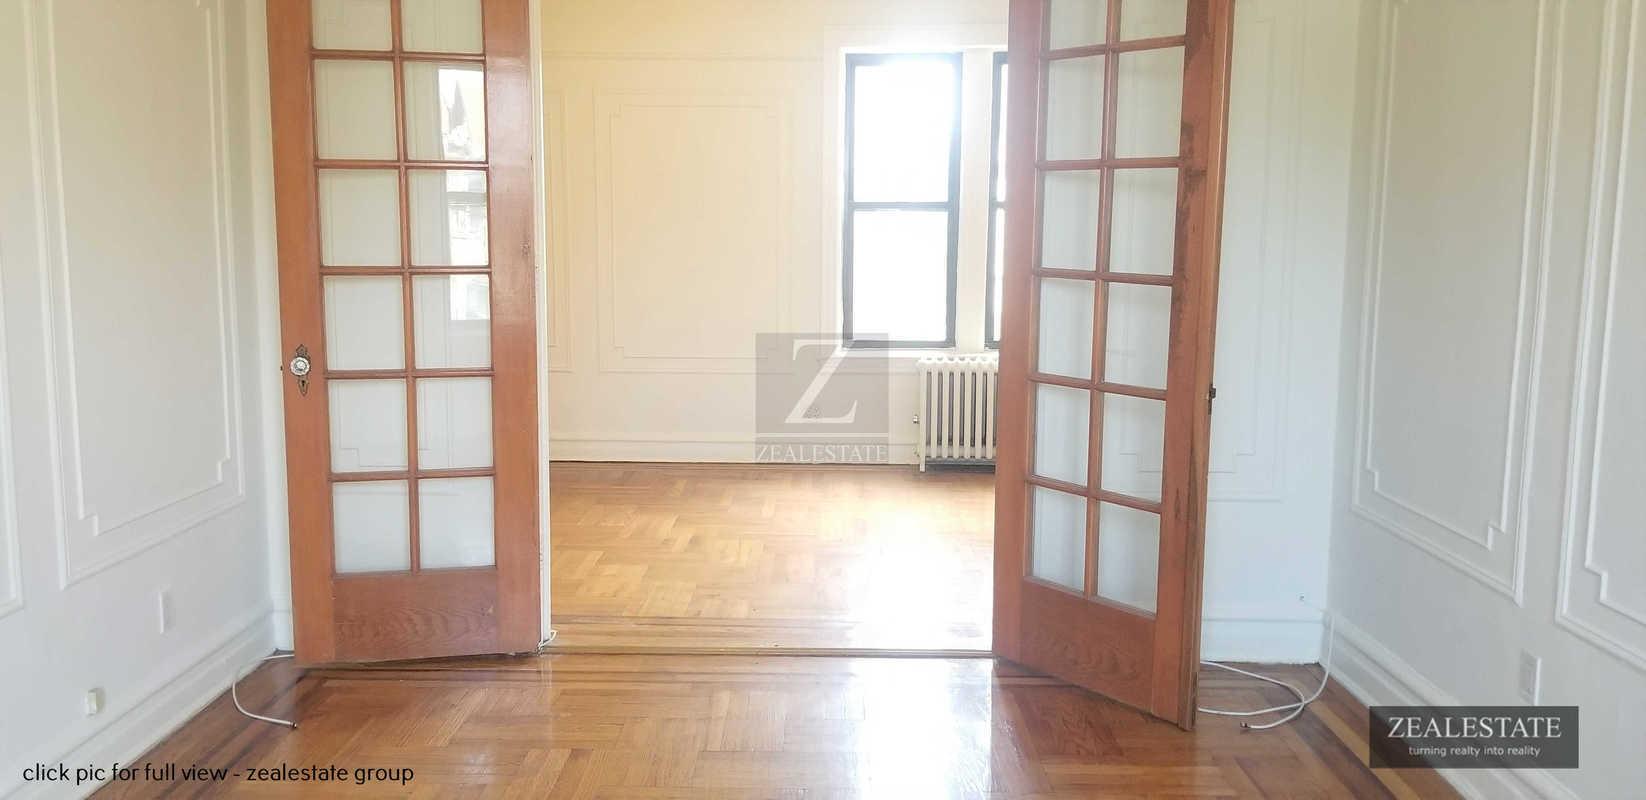 900 East 35th Street #2B in East Flatbush, Brooklyn | StreetEasy